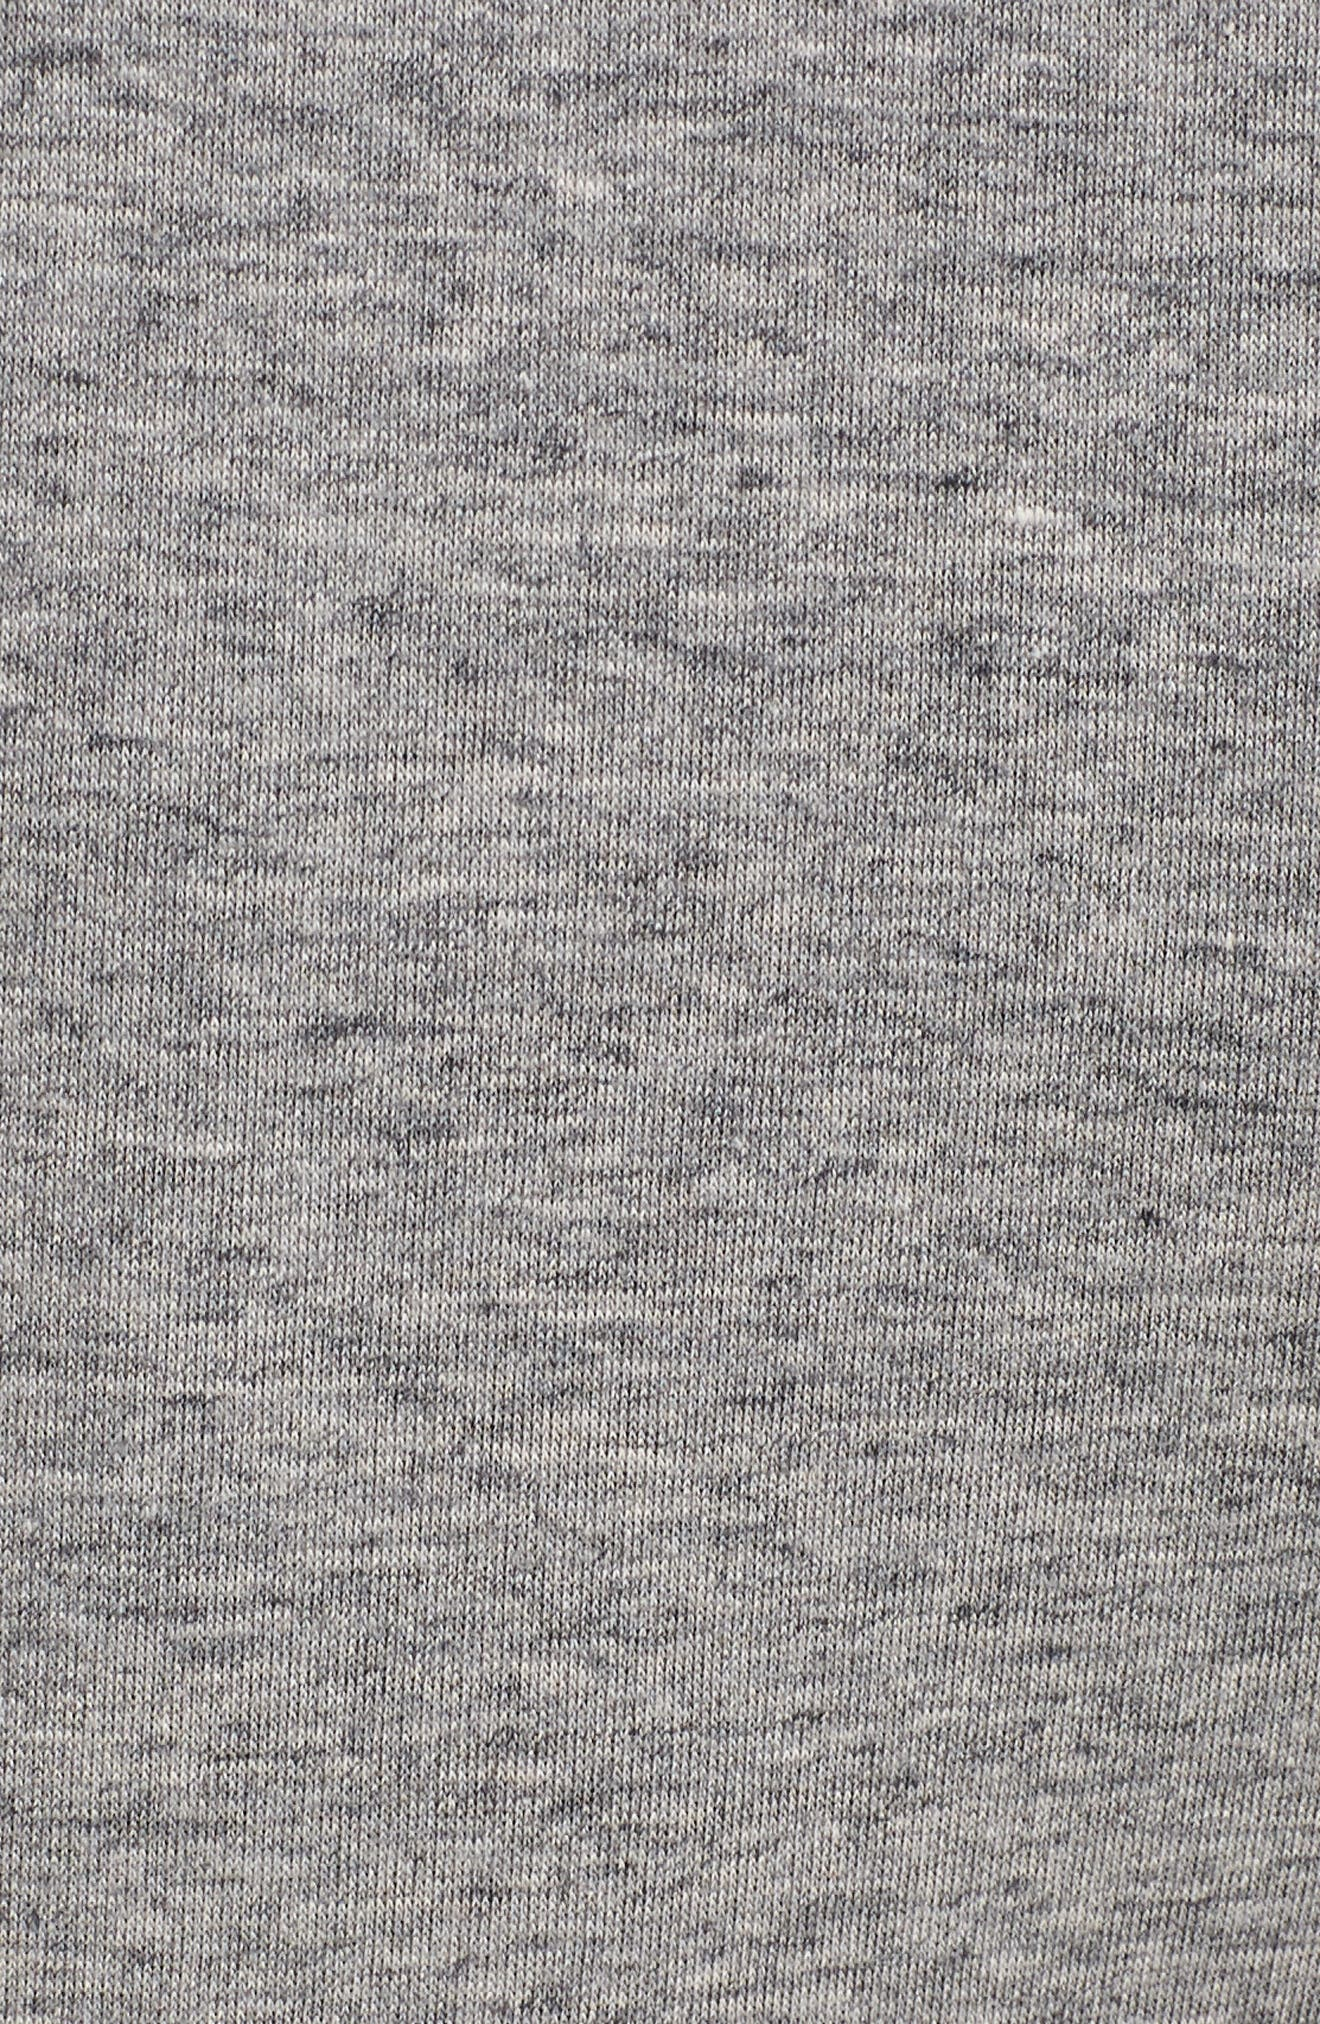 Lounge Pants,                             Alternate thumbnail 5, color,                             GREY HEATHER